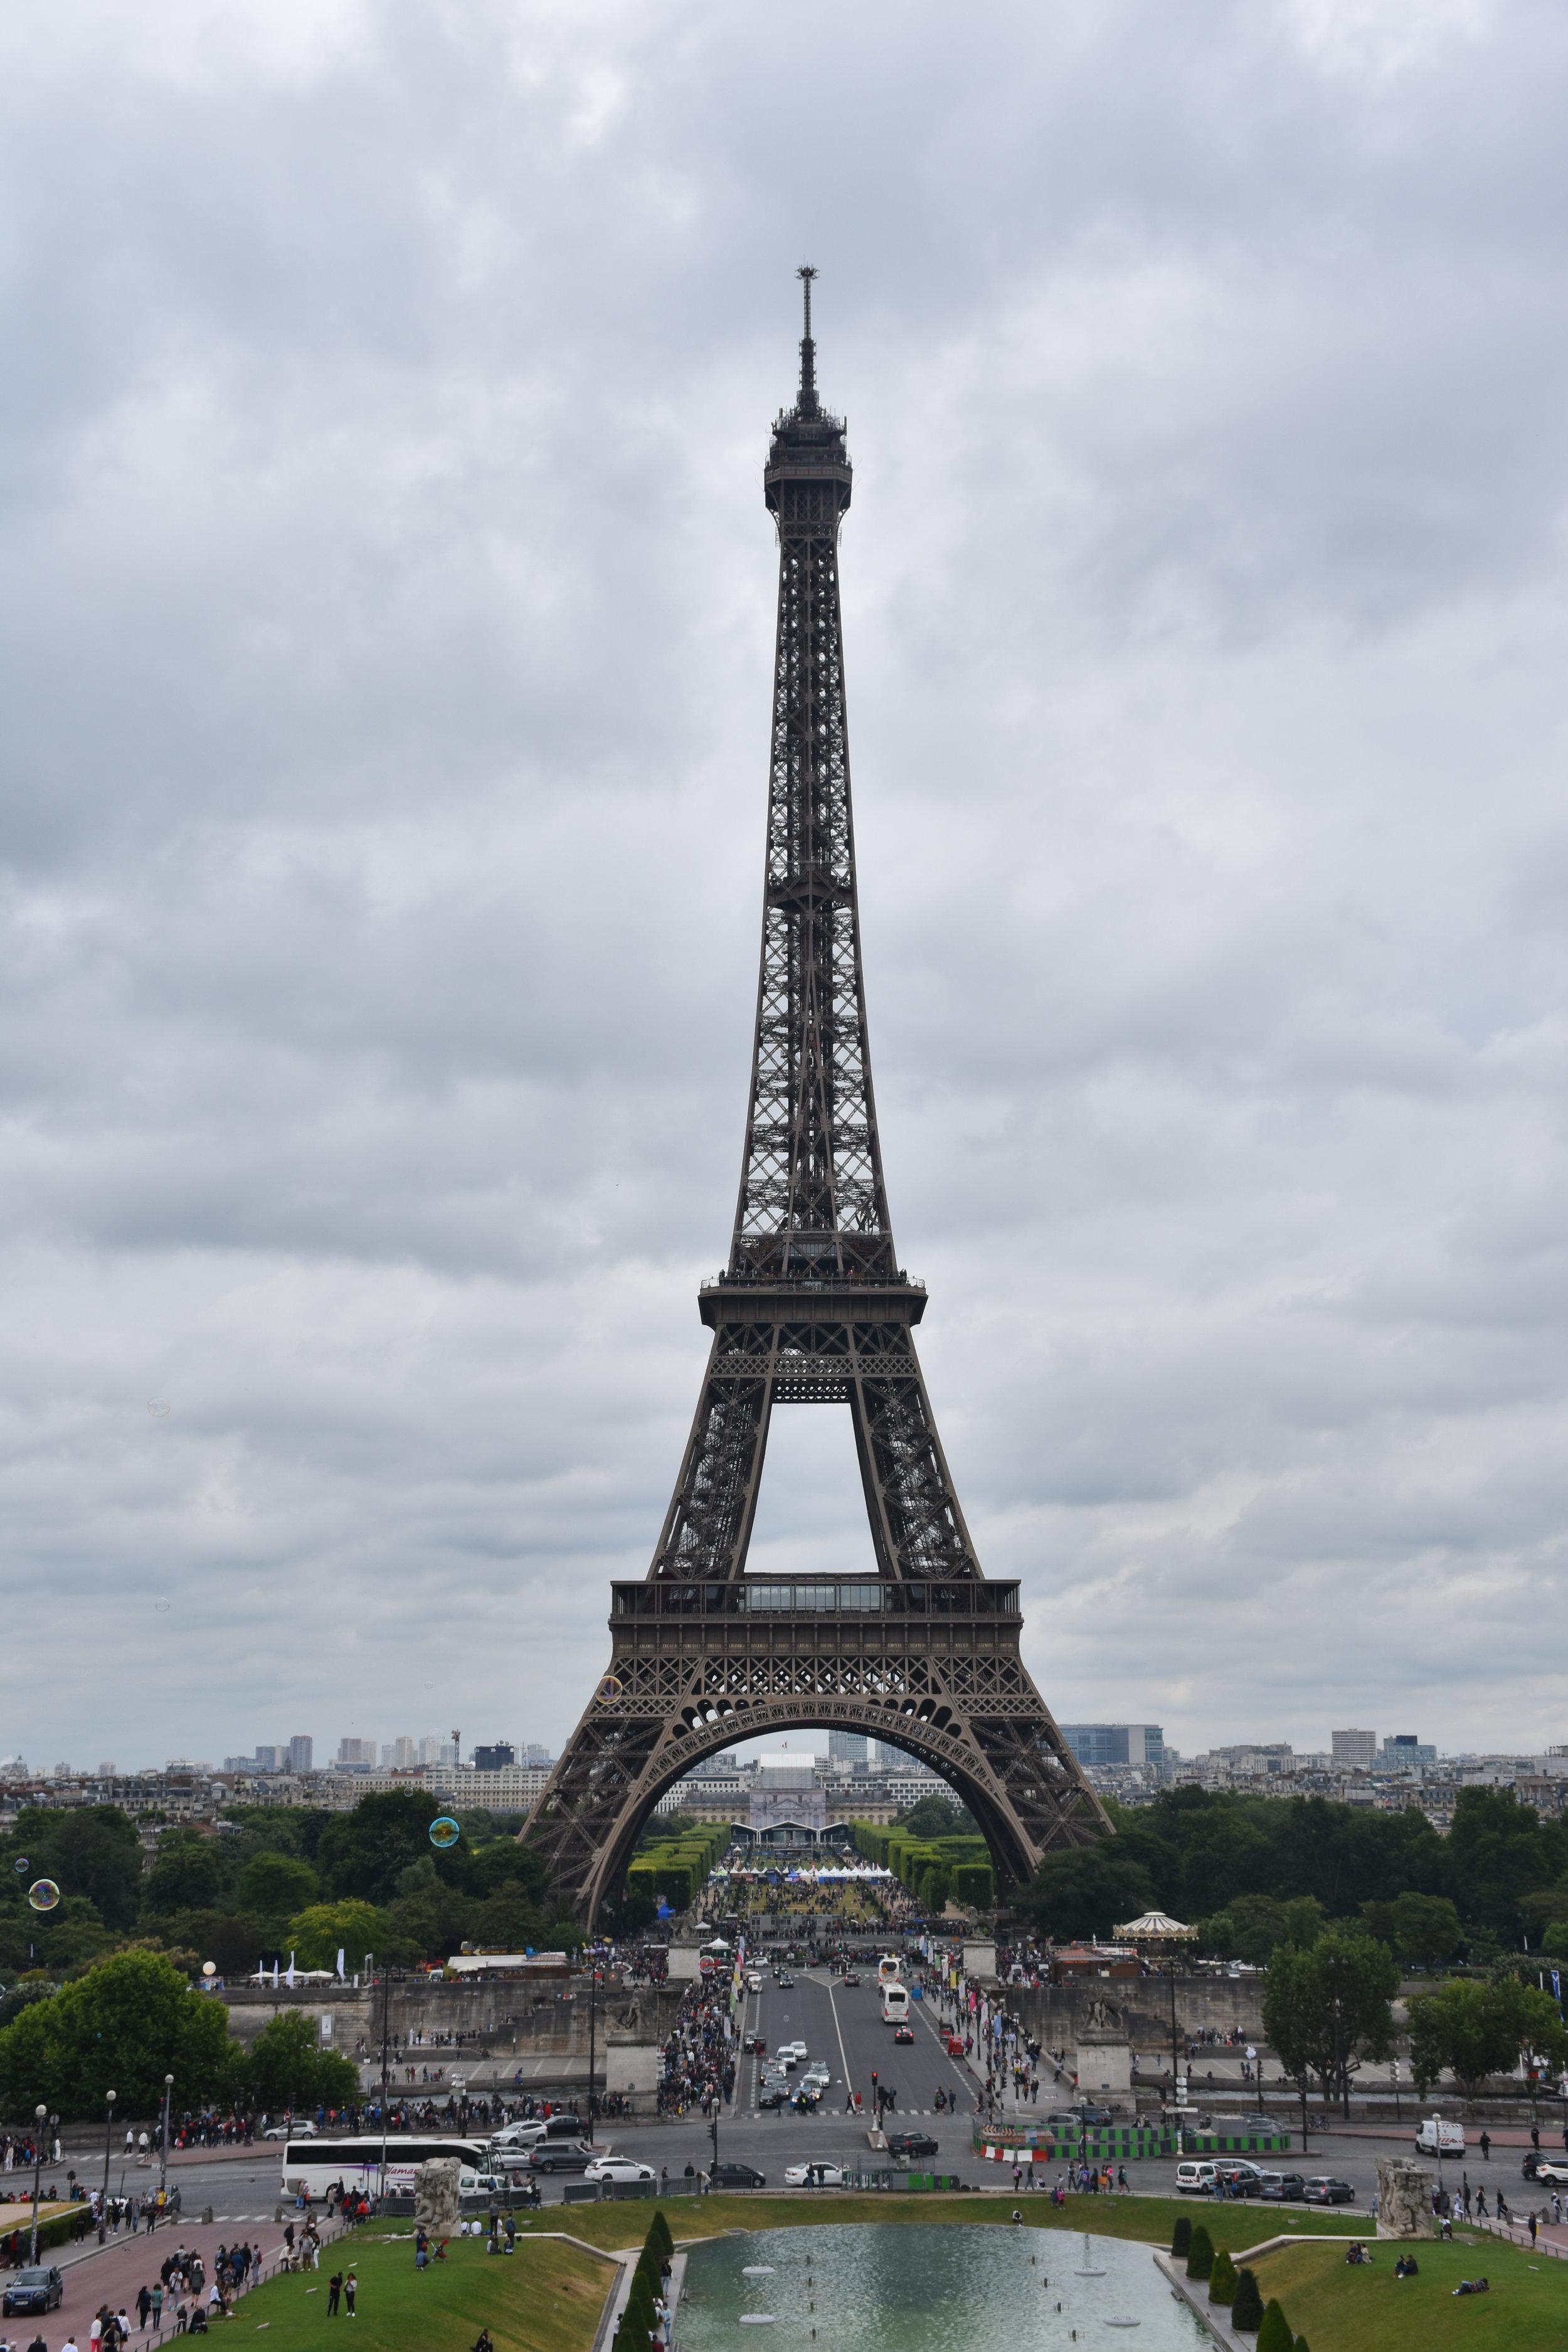 Tour Eiffel view from Trocadero